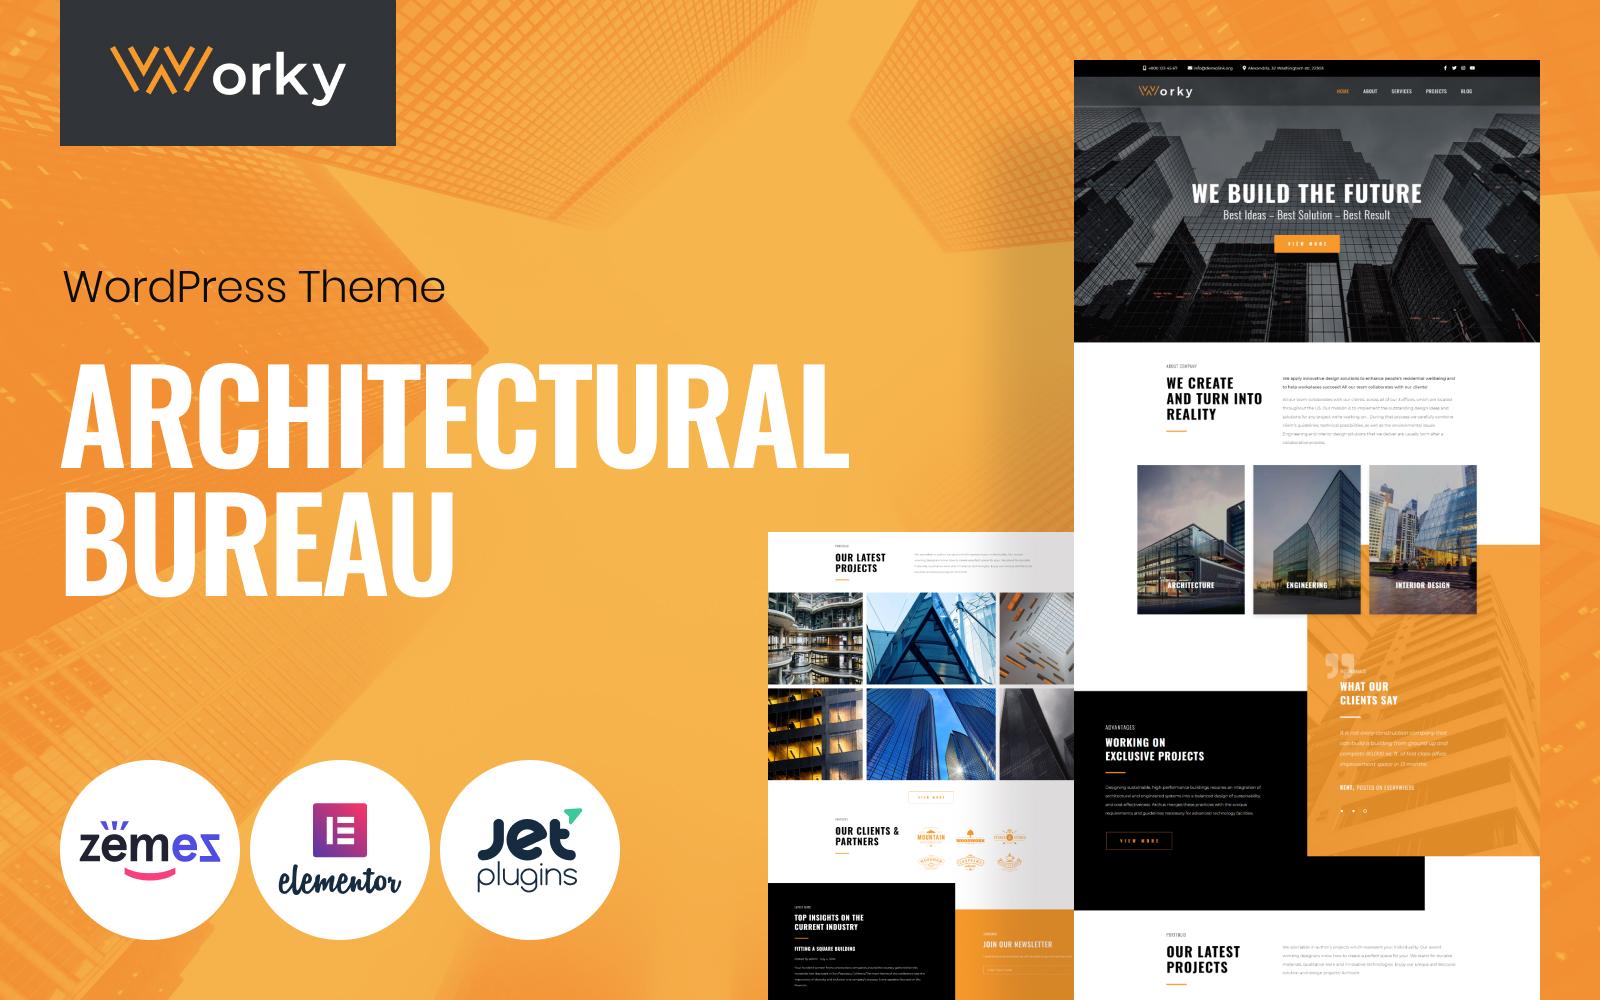 Responsywny motyw WordPress Worky - Architectural Bureau Multipurpose Modern Elementor #76333 - zrzut ekranu